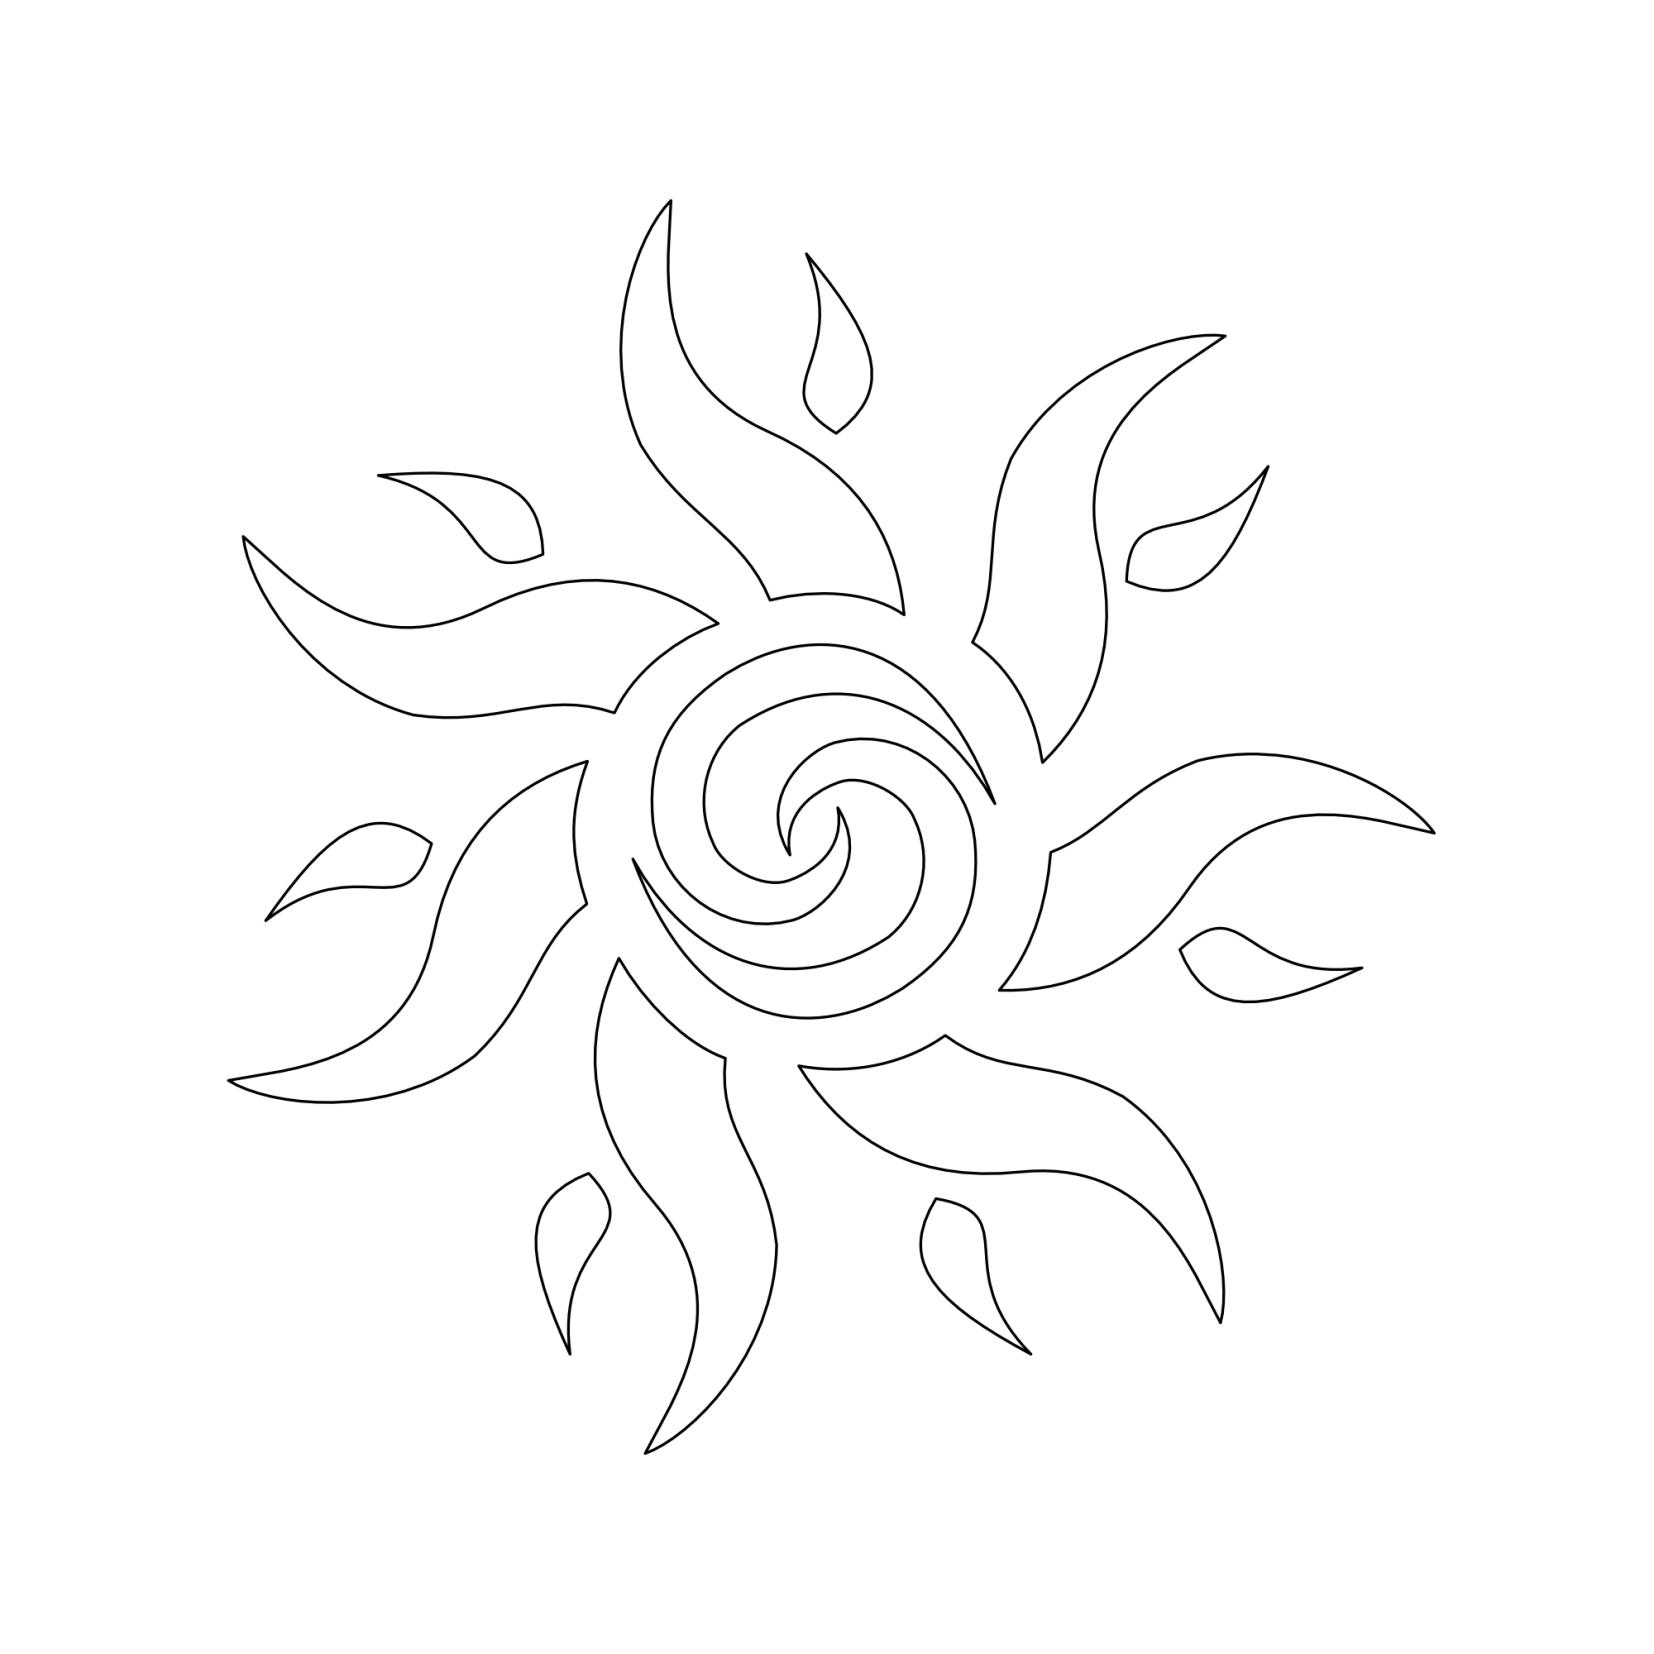 Tattoo Designs Stencils: Sun Stencils Tattoo Stencil Design From Kingdom Pictures